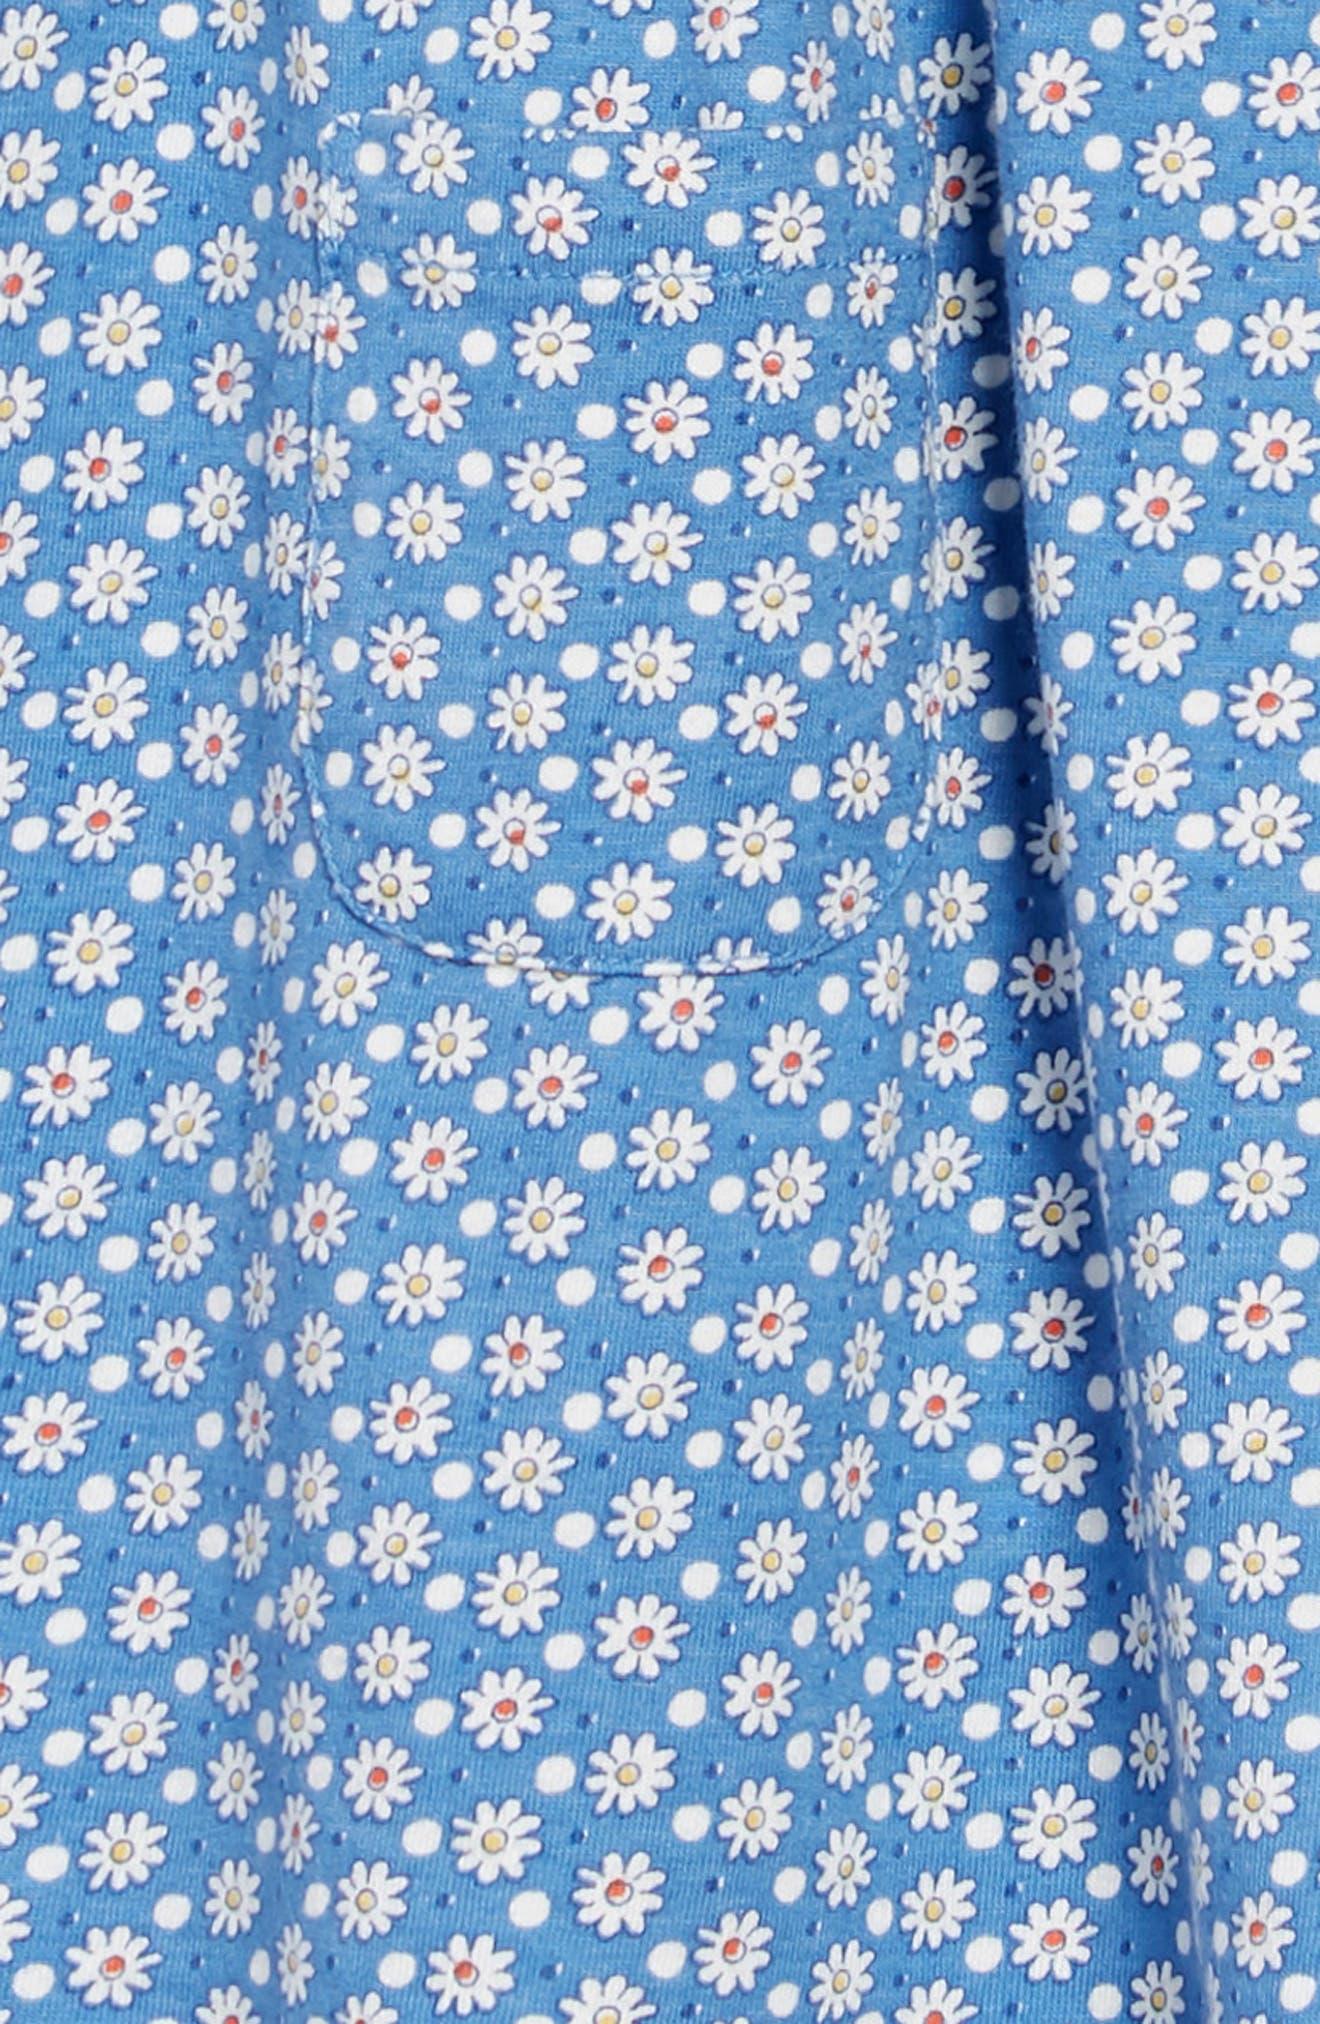 Peter Pan Collar Jersey Dress,                             Alternate thumbnail 3, color,                             BLU IVORY DAISY DOT